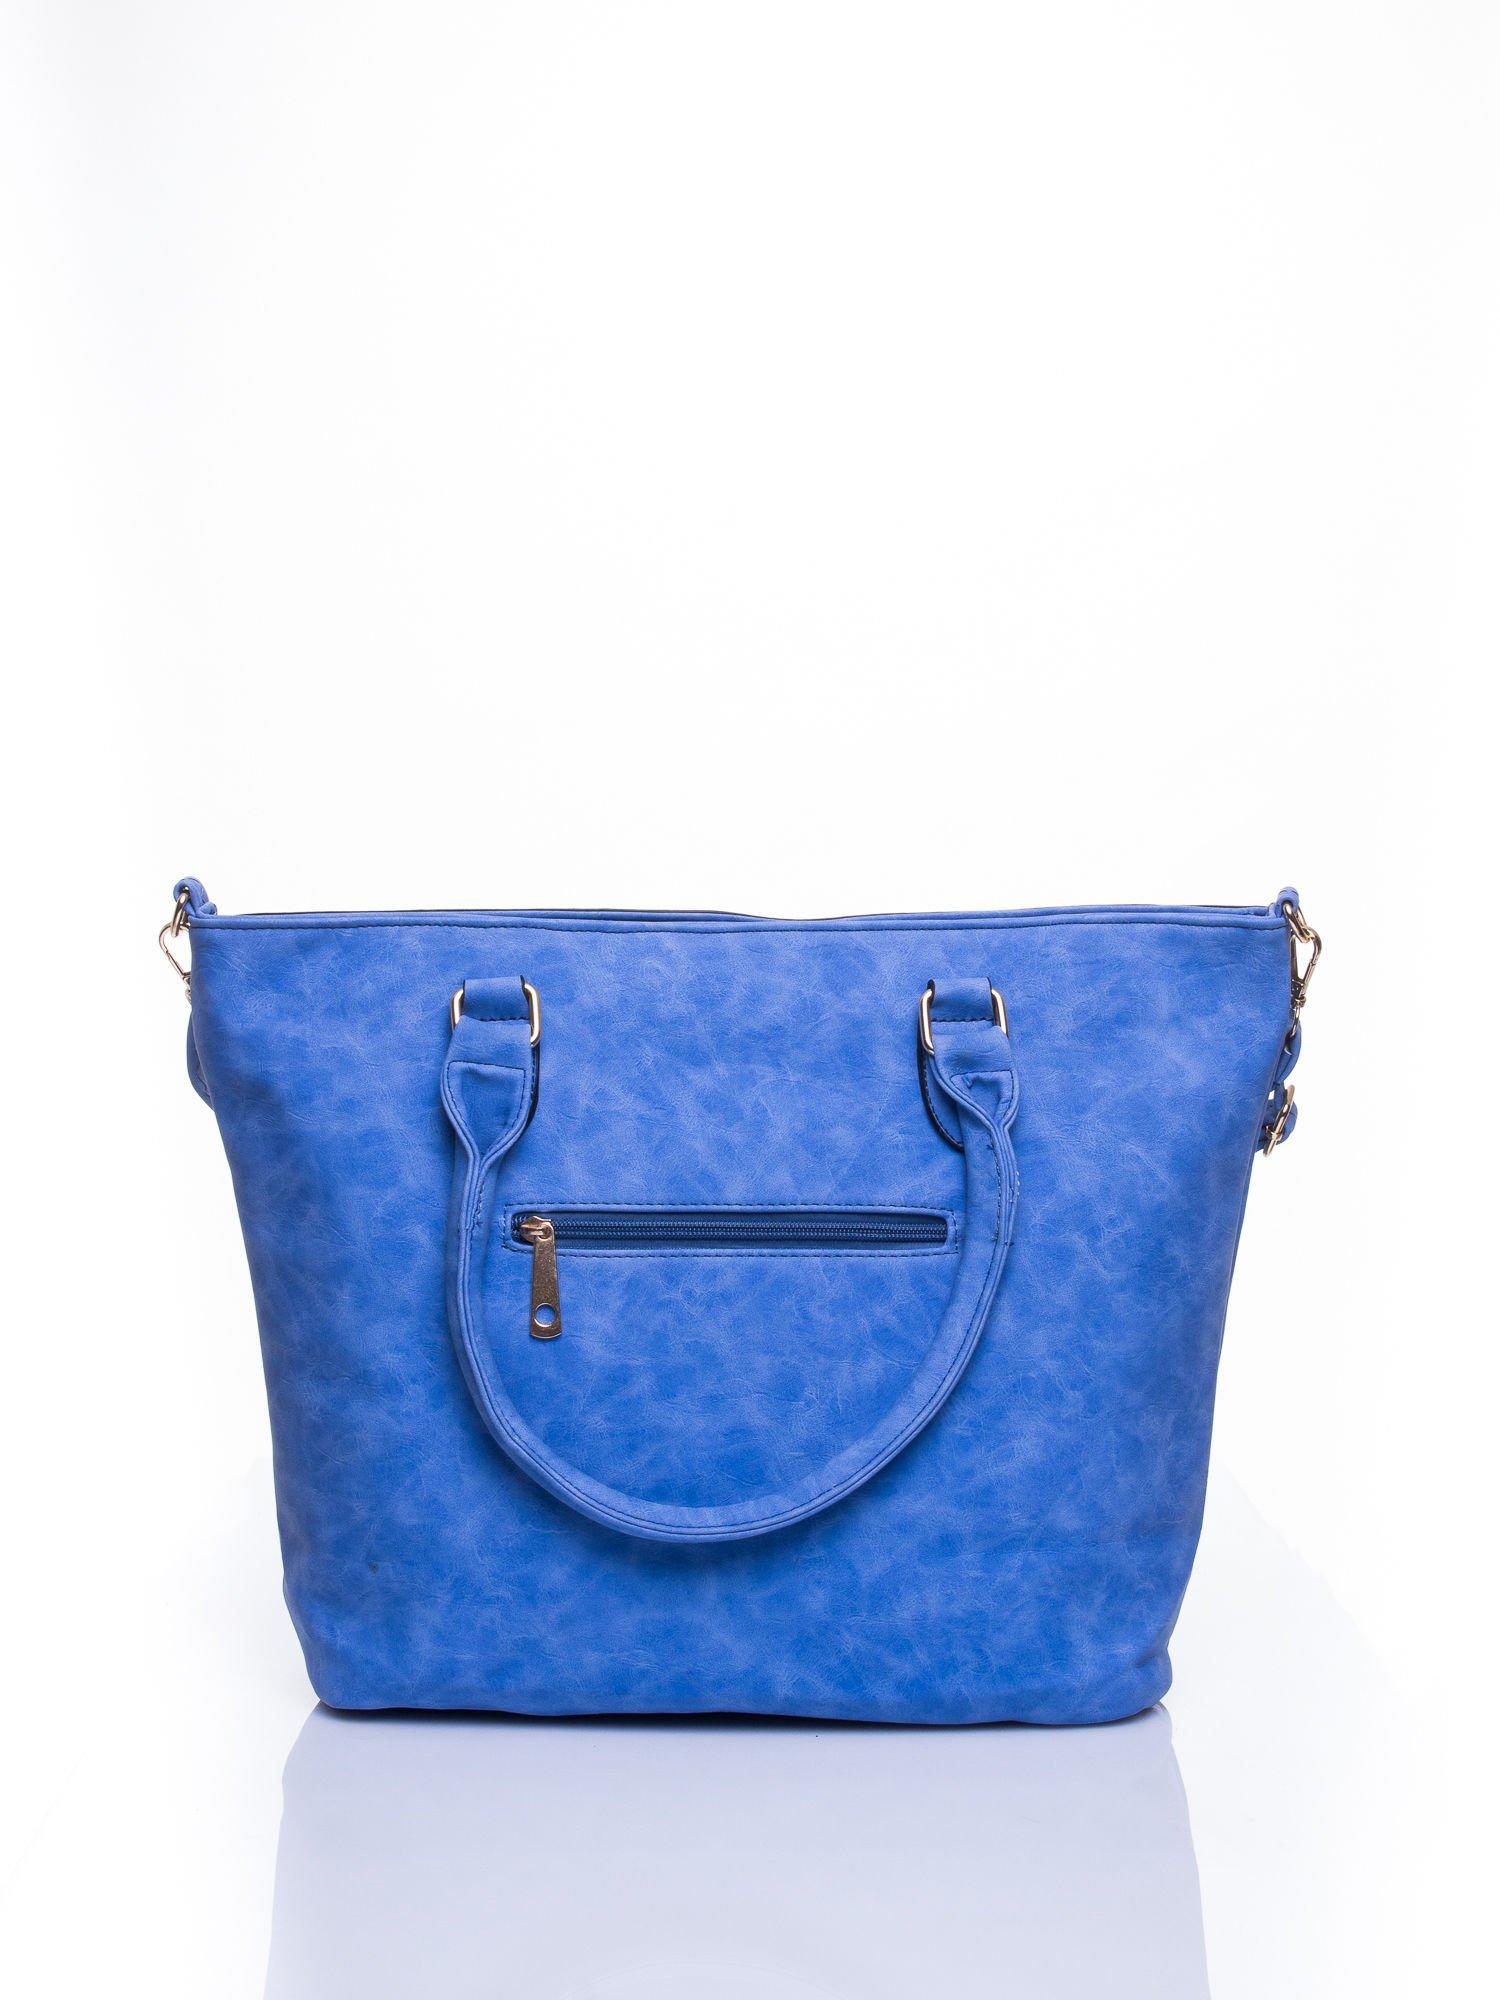 Niebieska torba city bag na ramię                                  zdj.                                  3